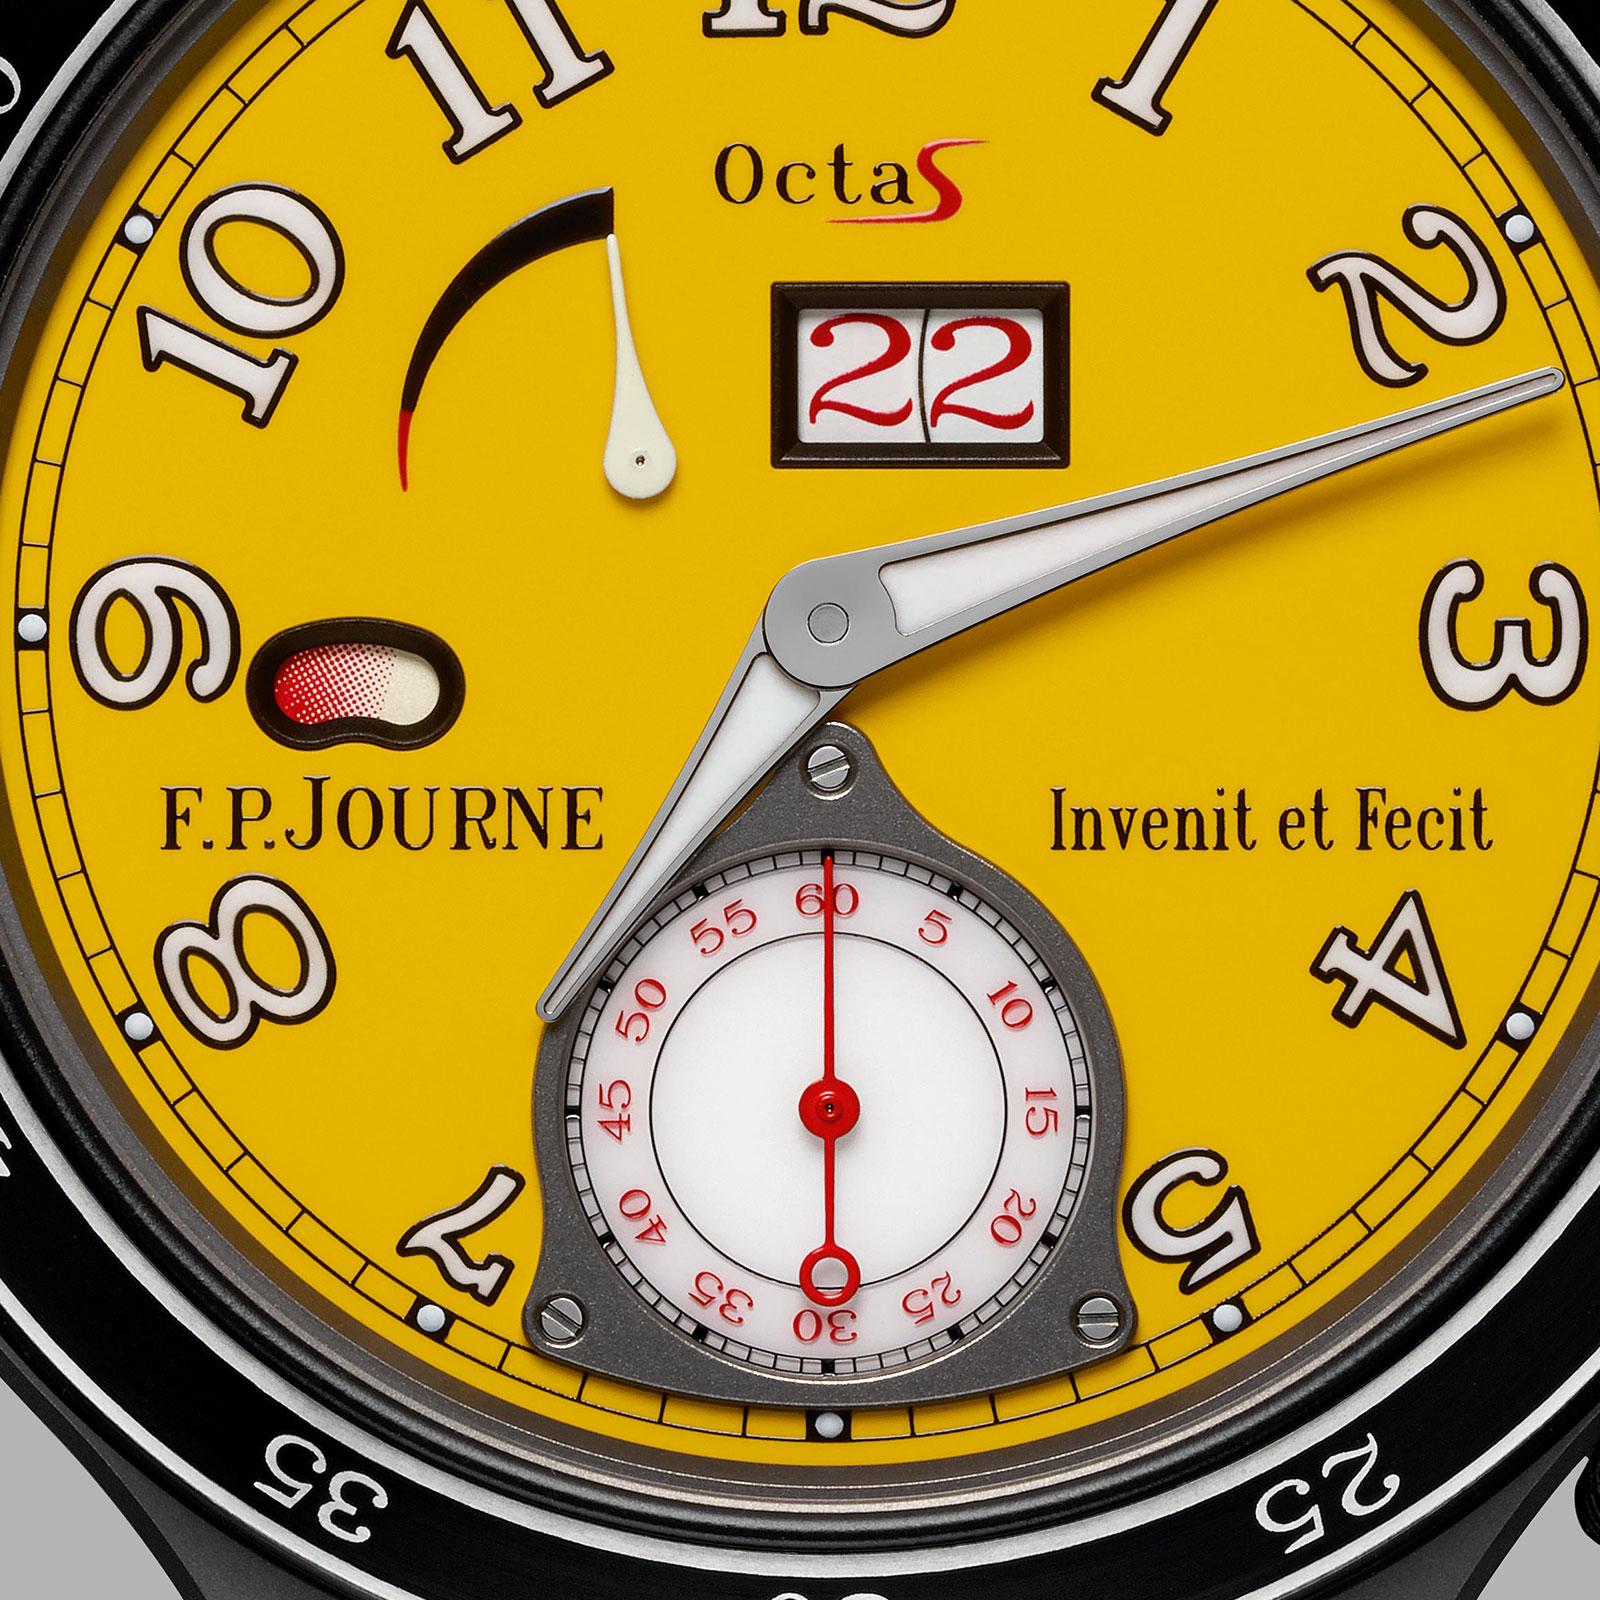 FP Journe Octa Sport yellow ARS2-2